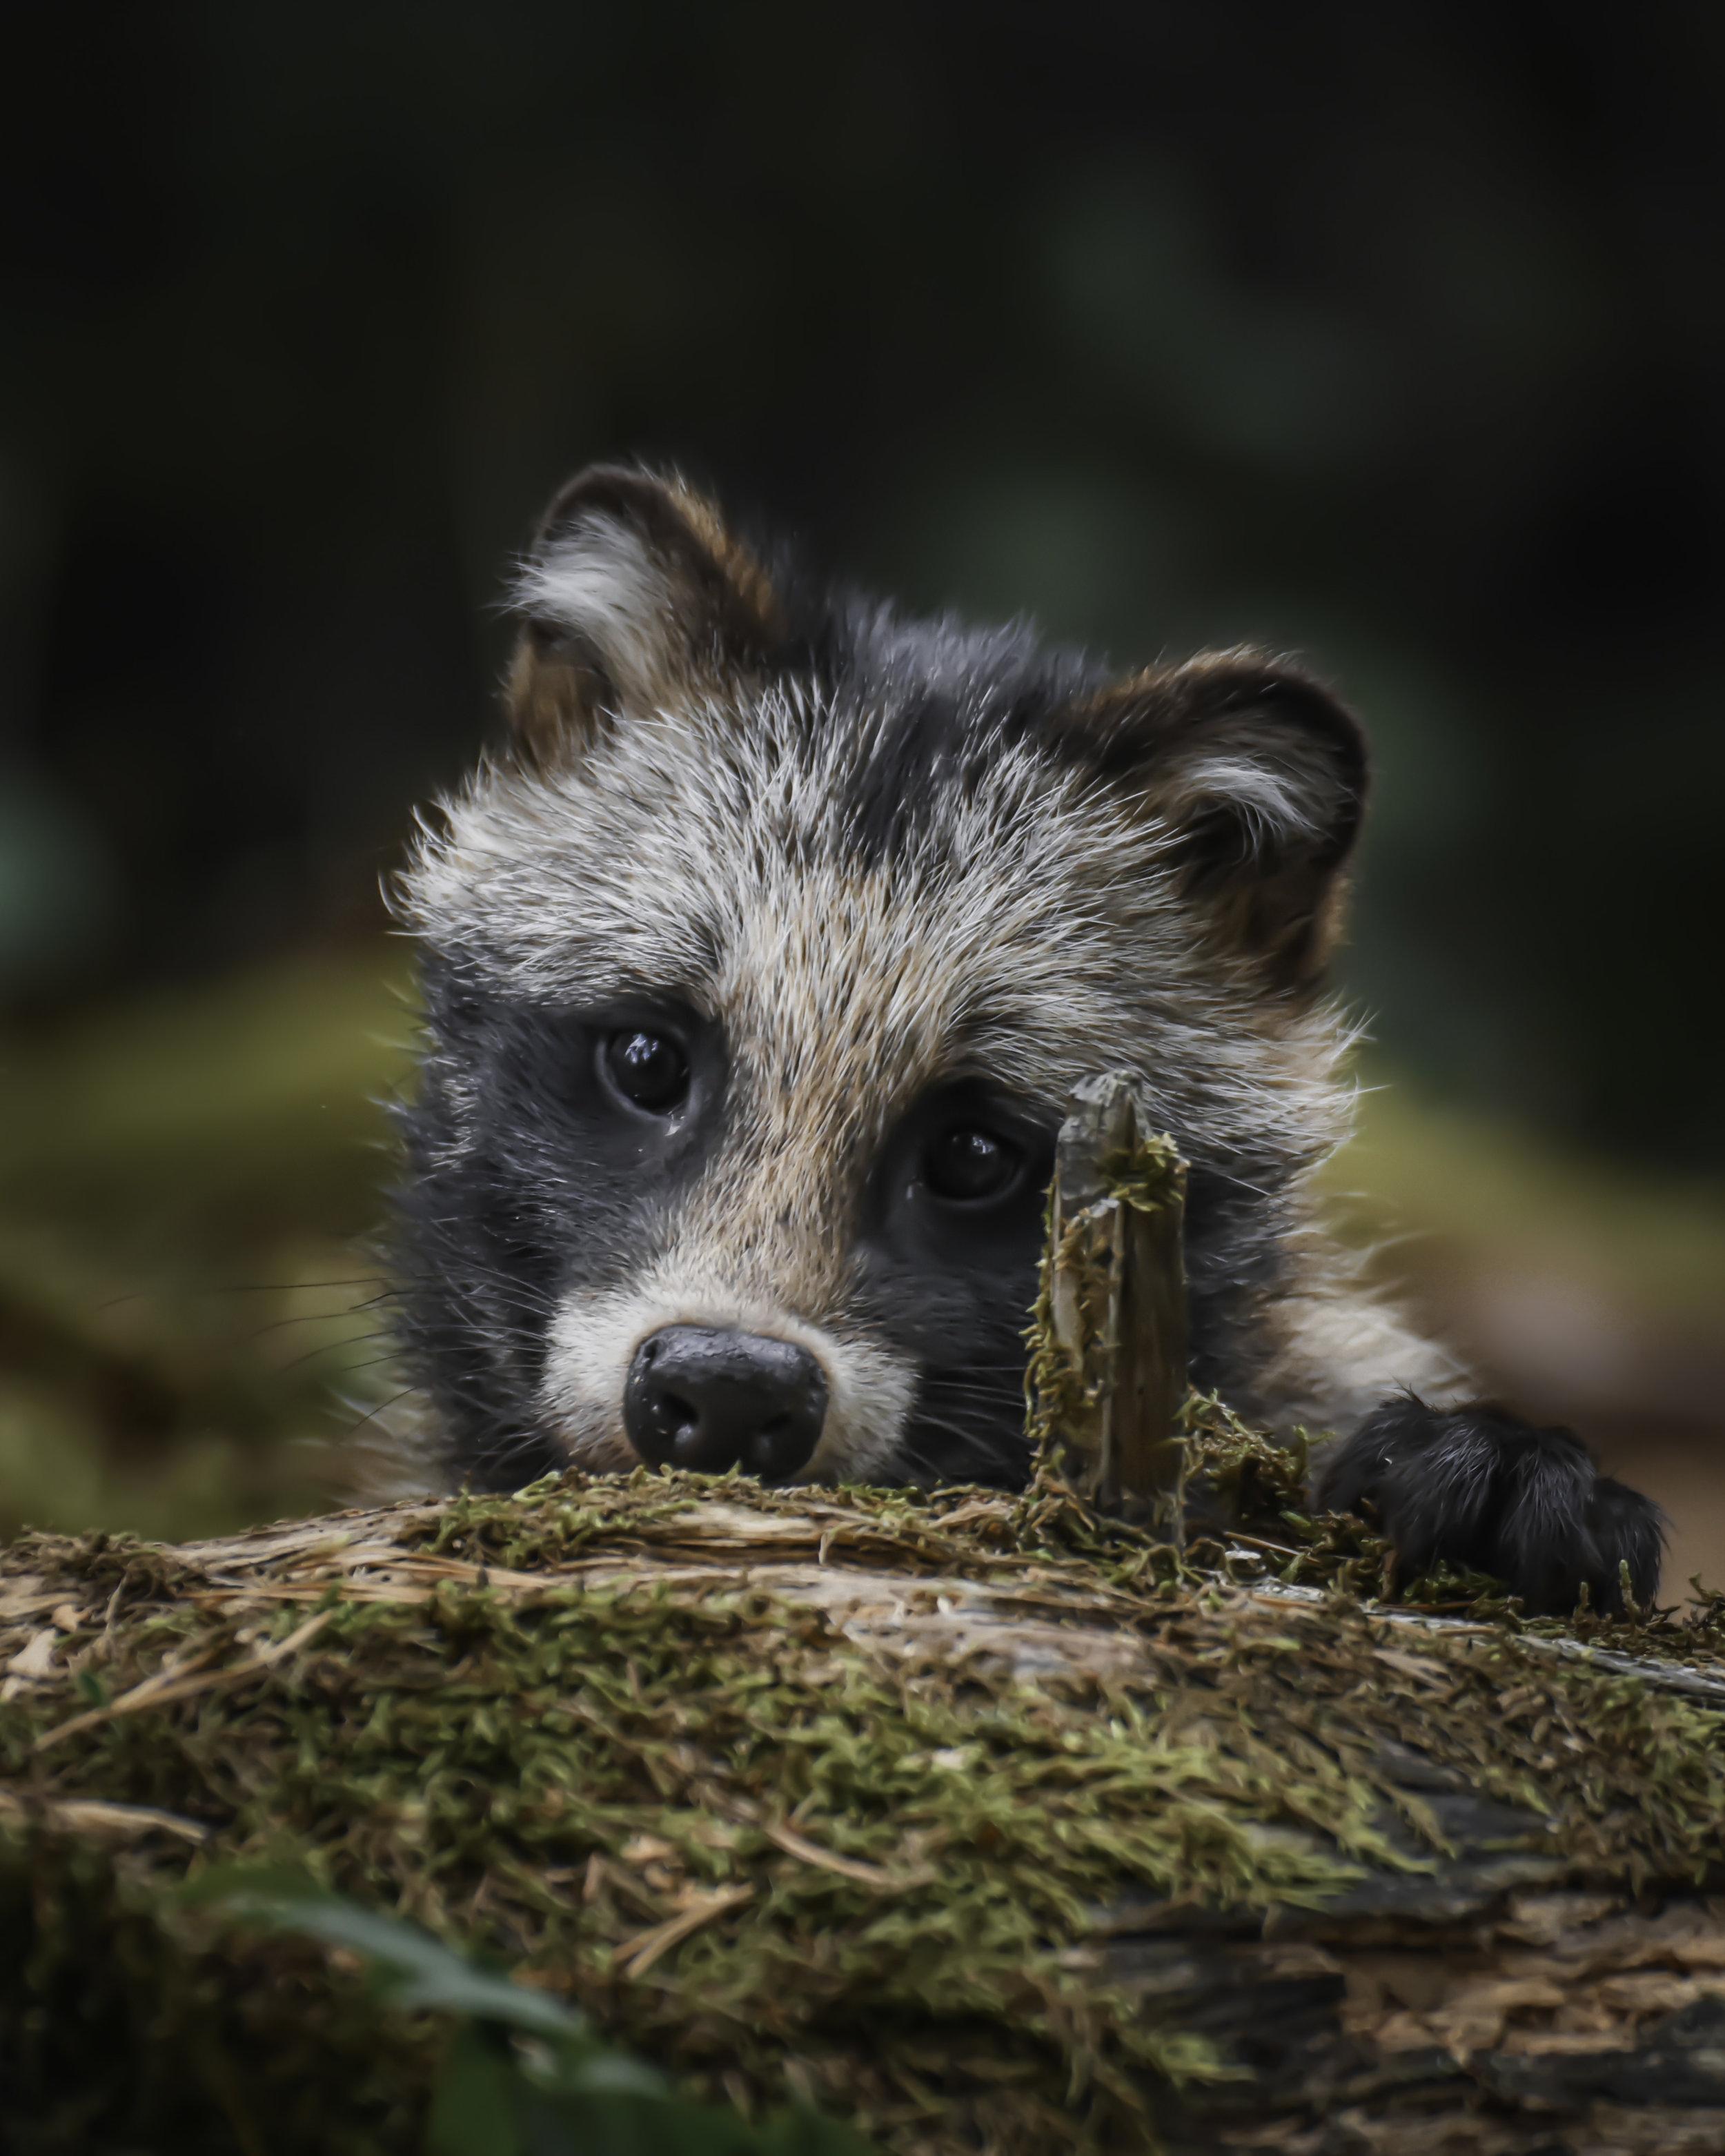 A raccoon dog pup I met in Finland's capital Helsinki.